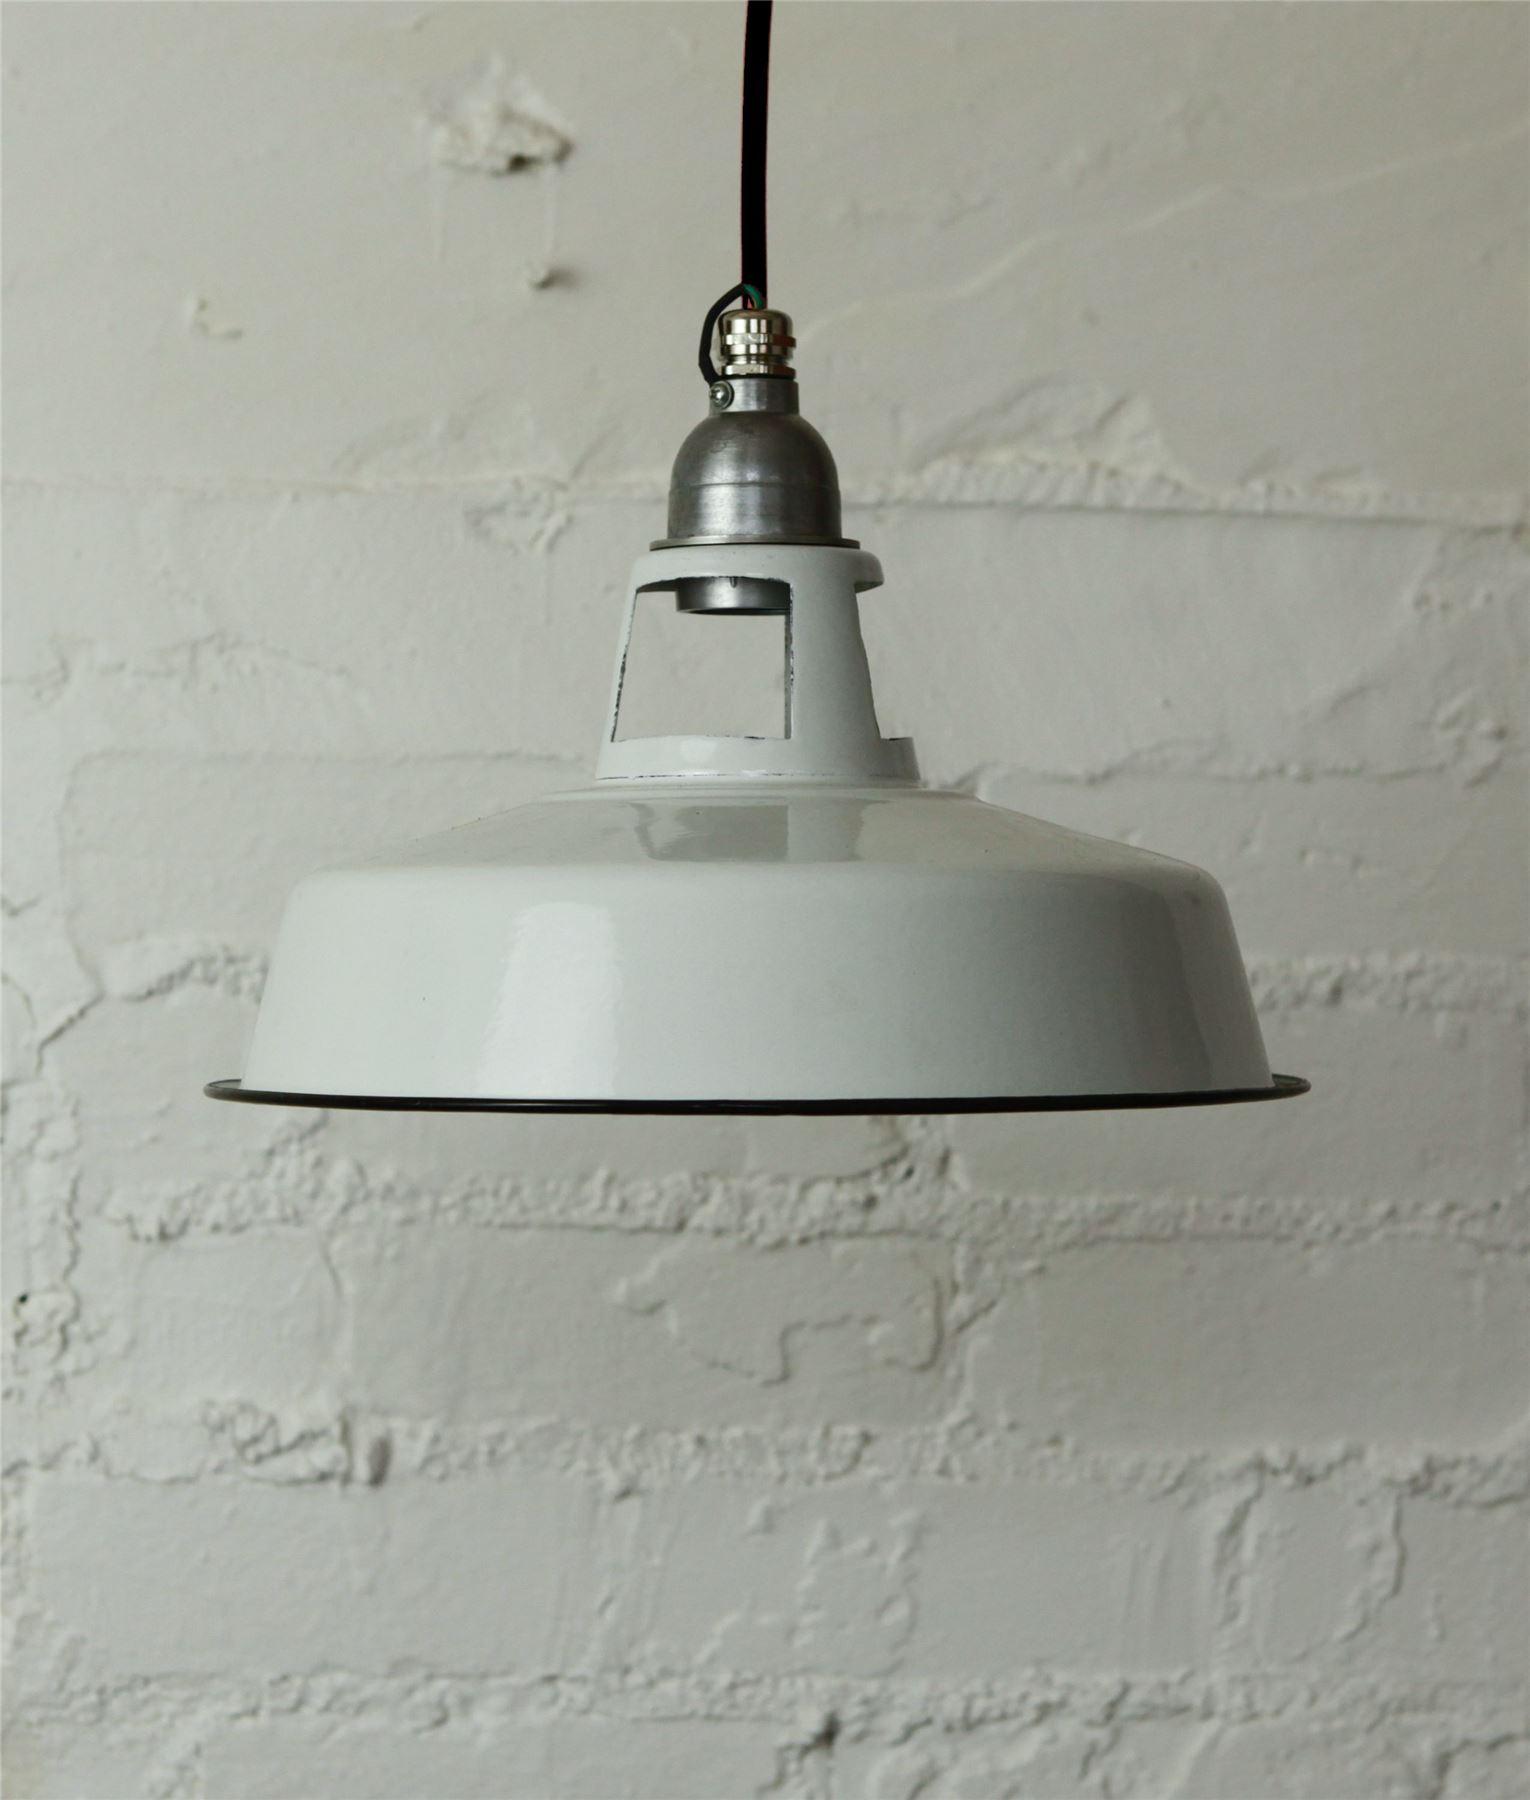 deckenleuchte wei emaille vintage industrie lampenschirm stoffkabel ebay. Black Bedroom Furniture Sets. Home Design Ideas